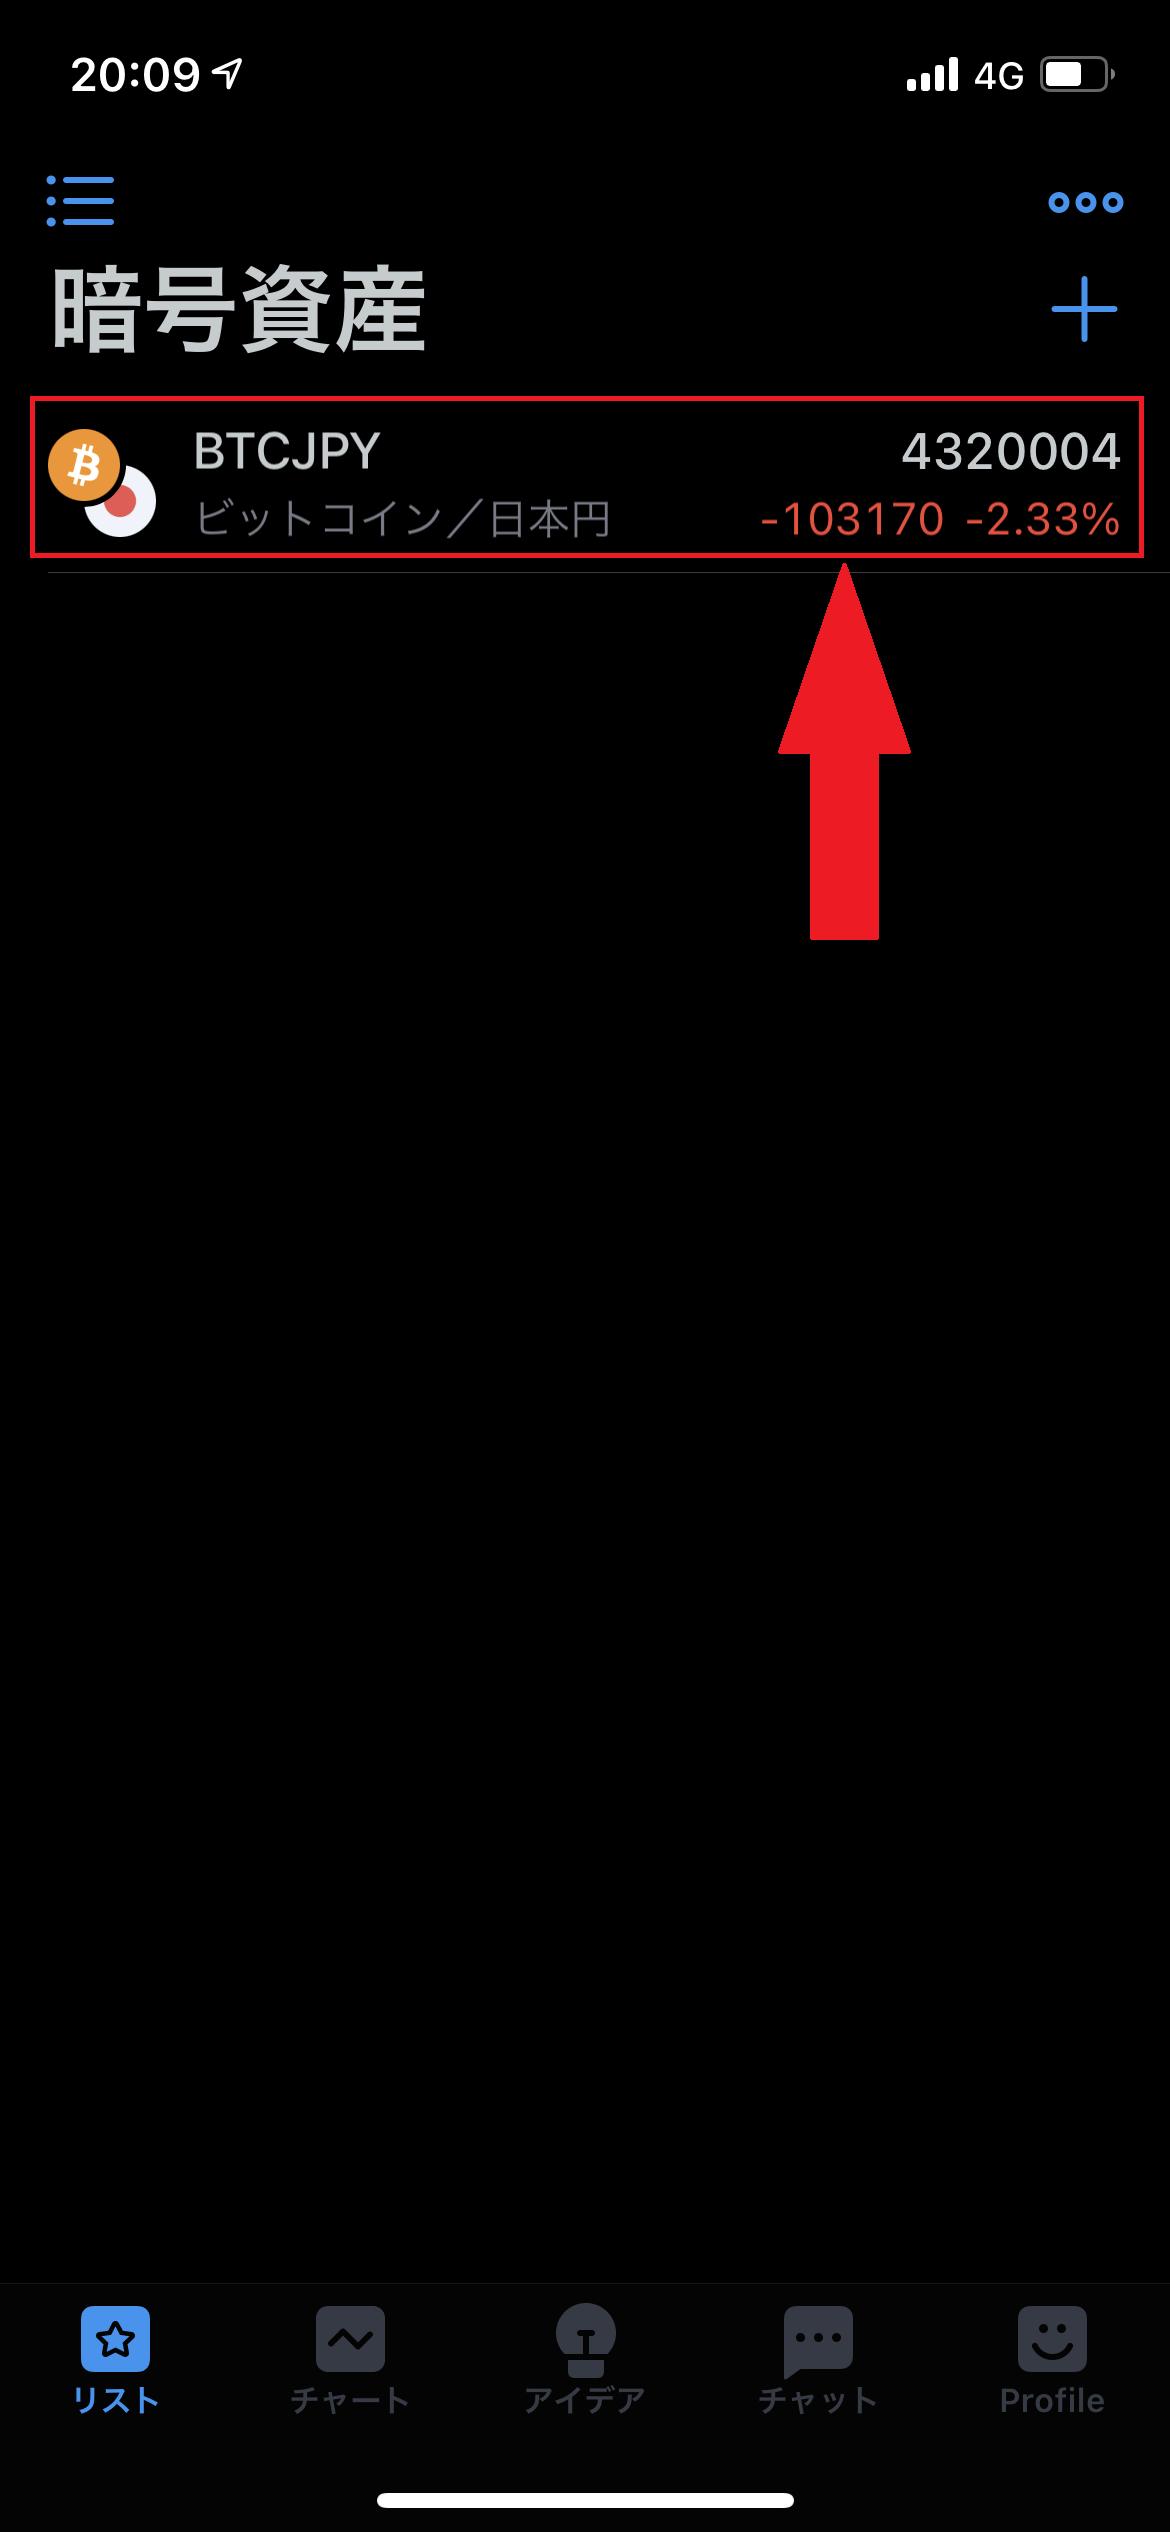 TradingViewの暗号資産のリストにビットコインを追加したスクリーンショット